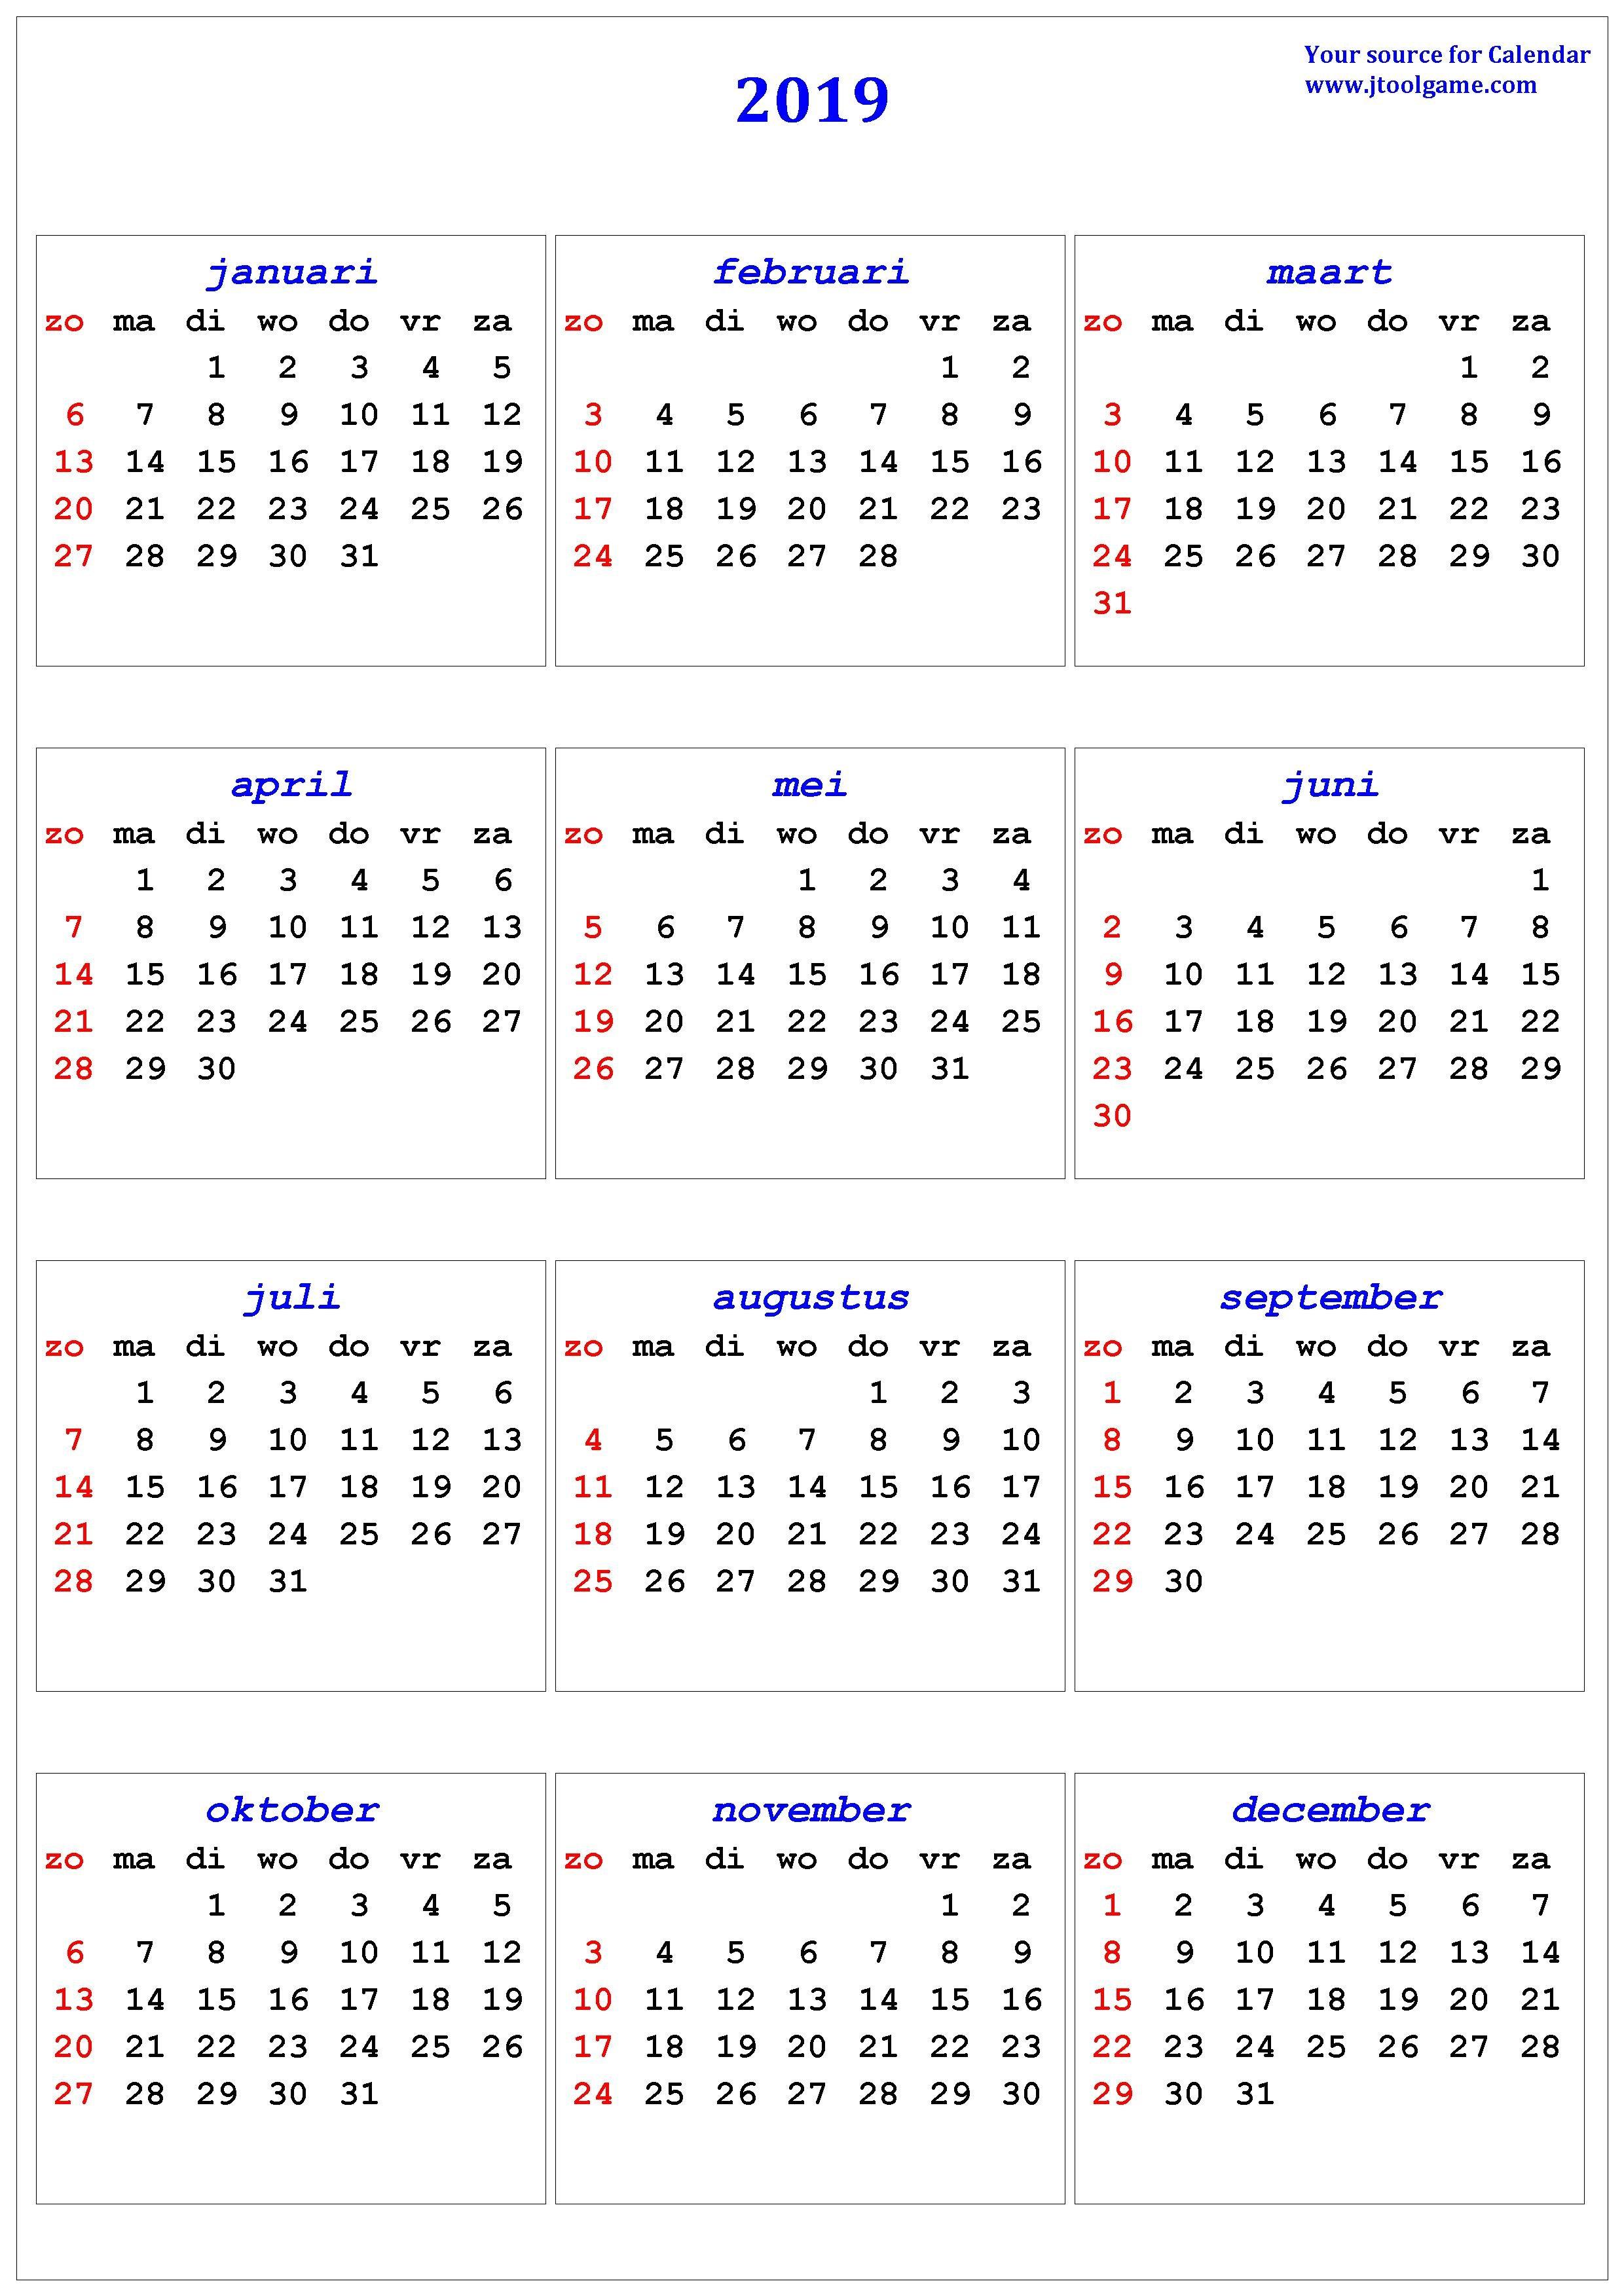 2019 Calendar – Printable Calendar. 2019 Calendar In Multiple Colors Calendar 2019 Za